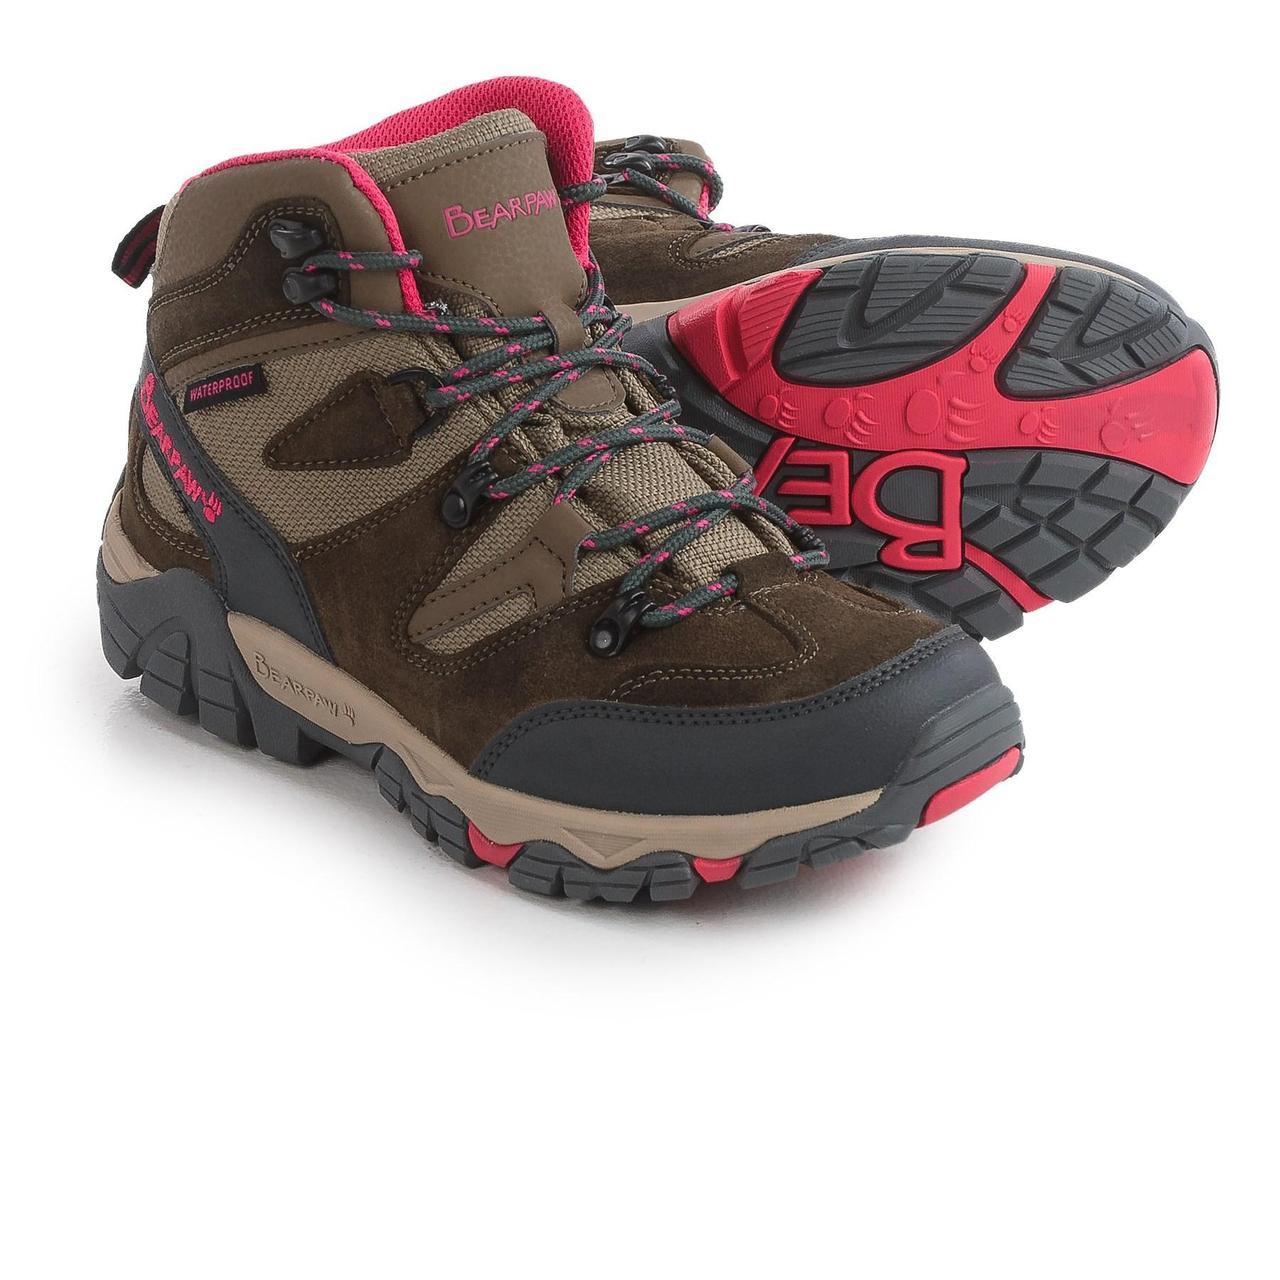 Bearpaw Женские ботинки 8899183123024